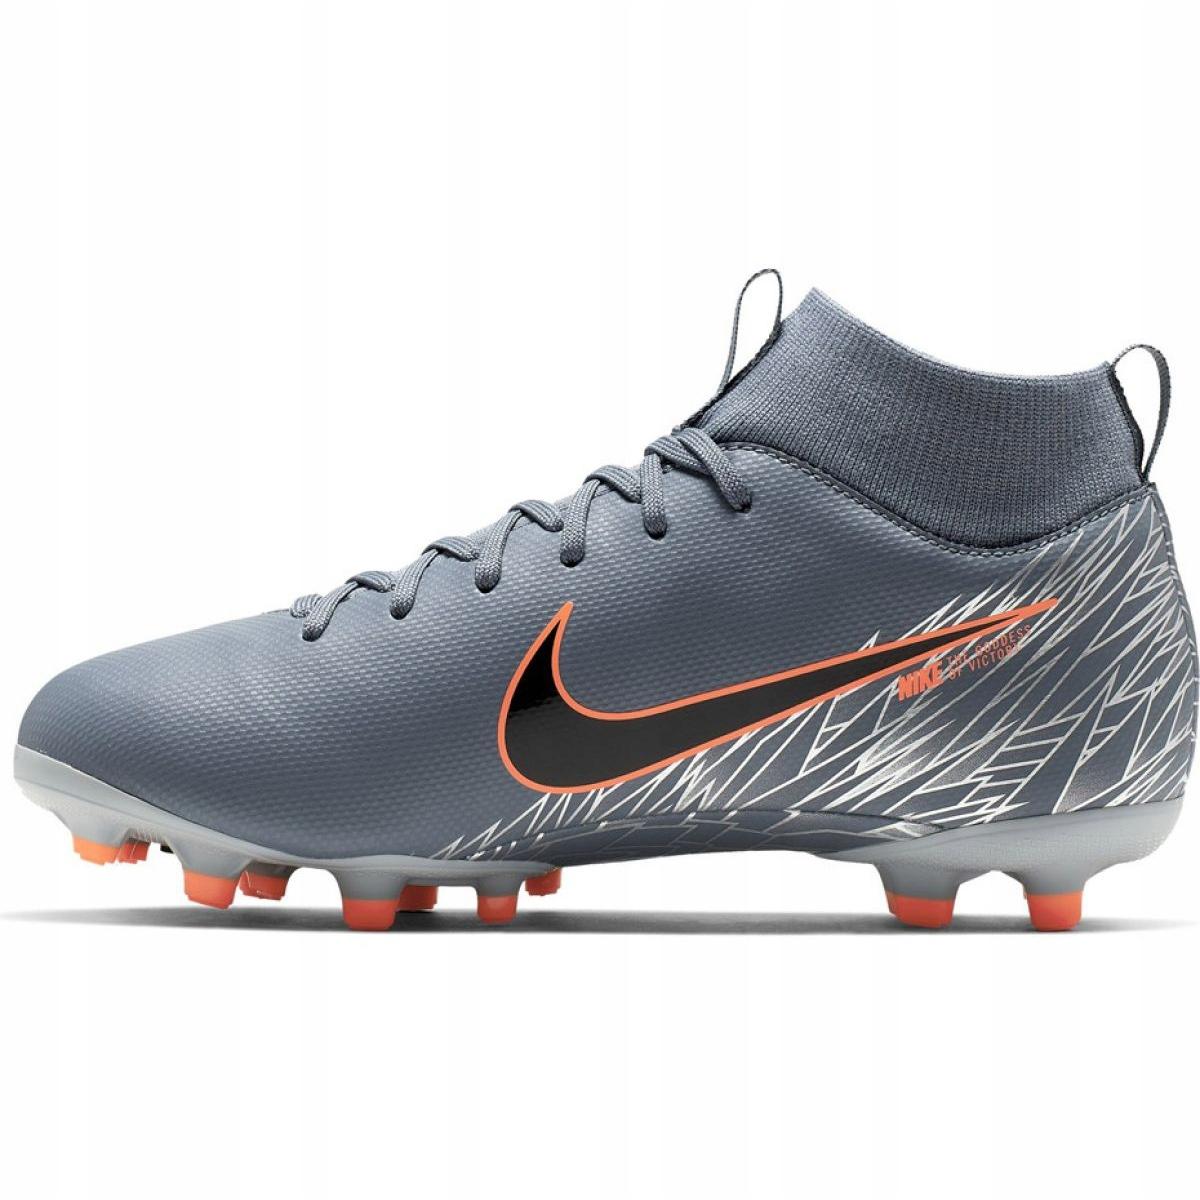 Sumamente elegante Marte Boquilla  Nike Mercurial Superfly 6 Academy Mg Jr AH7337 408 football shoes  multicolored grey - ButyModne.pl